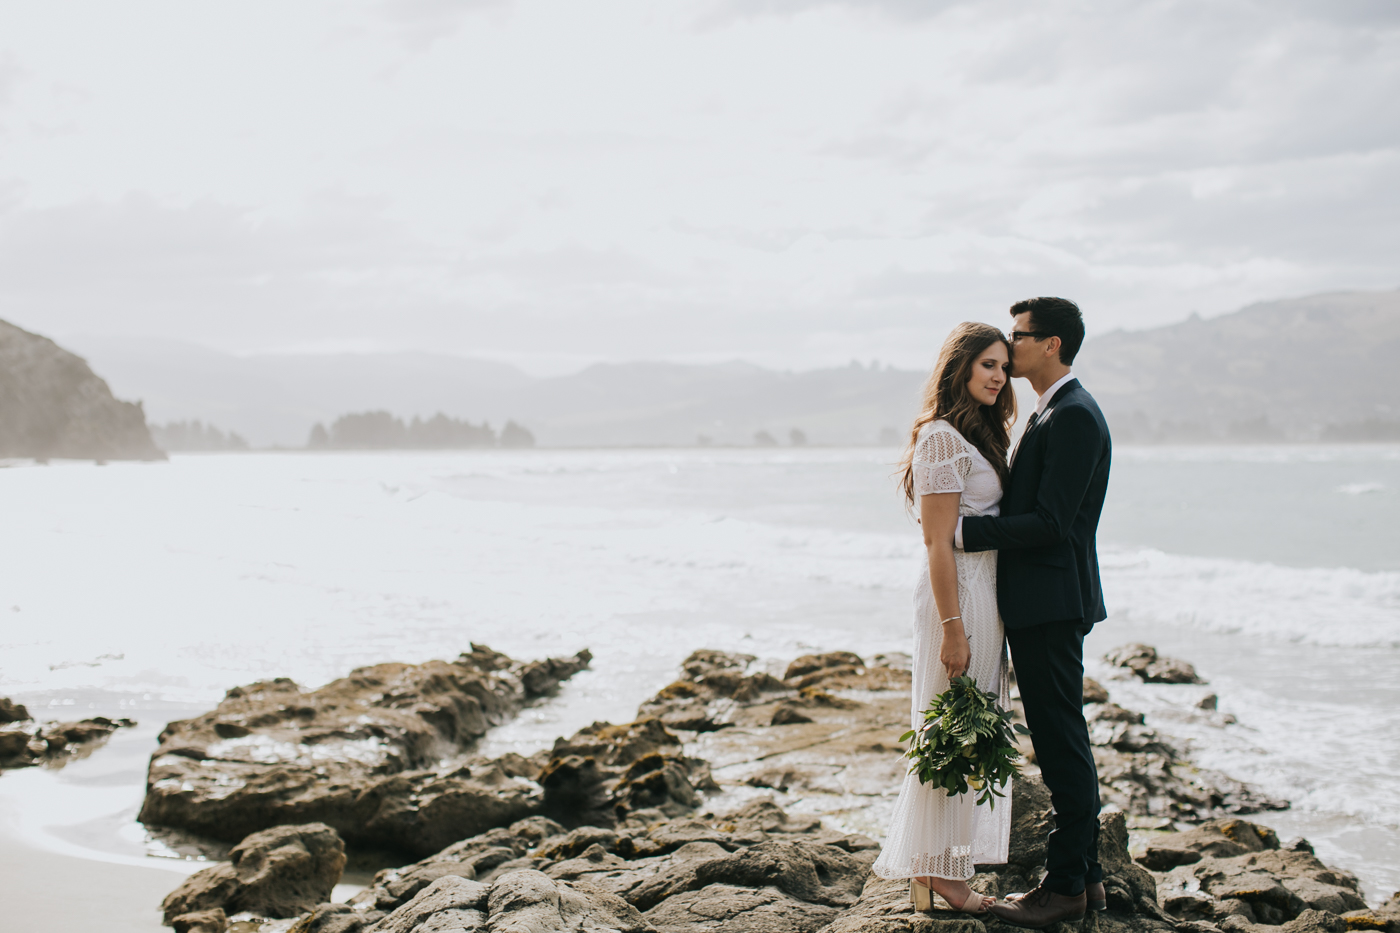 Ariana & Tim - Dunedin, New Zealand Wedding - Destination Wedding - Samantha Heather Photography-152.jpg